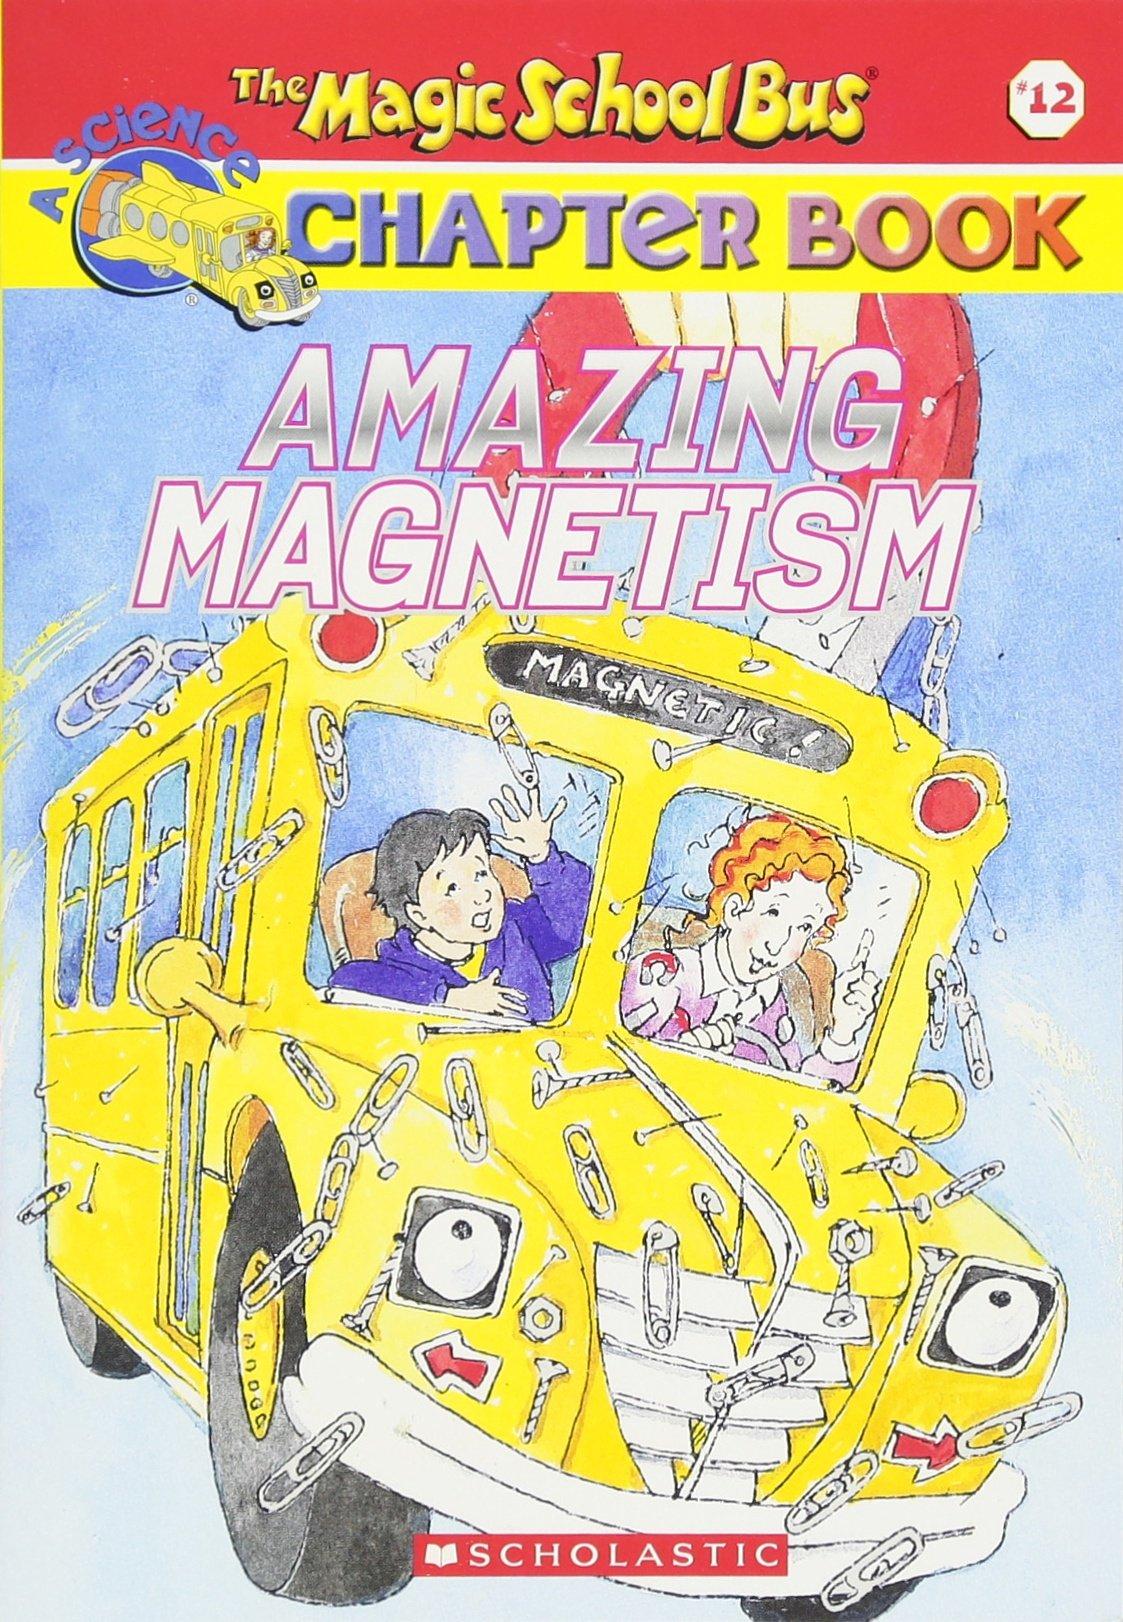 Amazing Magnetism (Magic School Bus Chapter Book #12) pdf epub